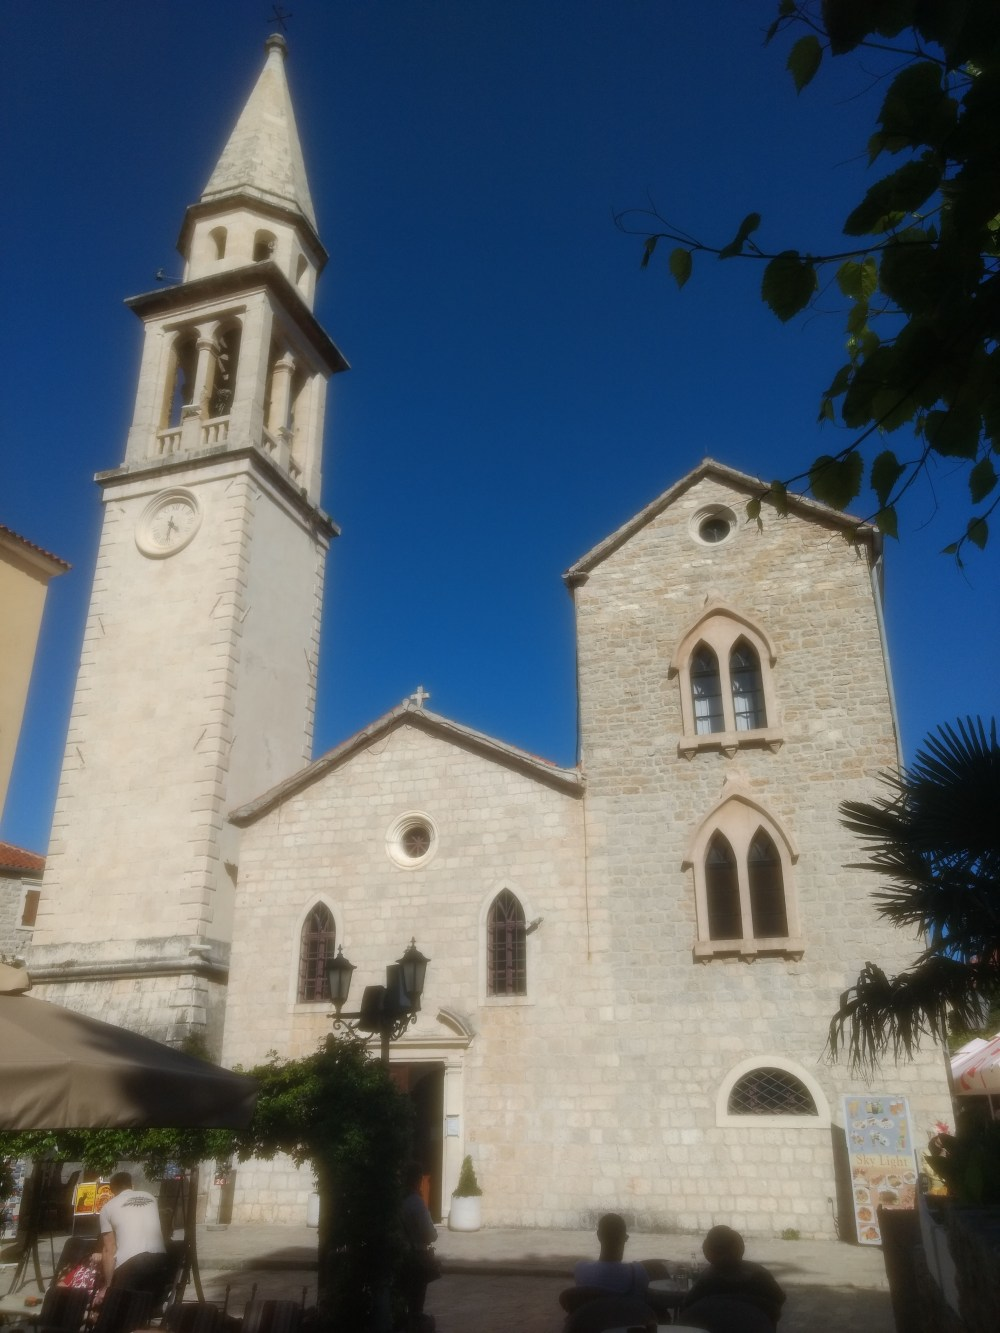 Saint Ivan Church, Old Town, Budva, Montenegro